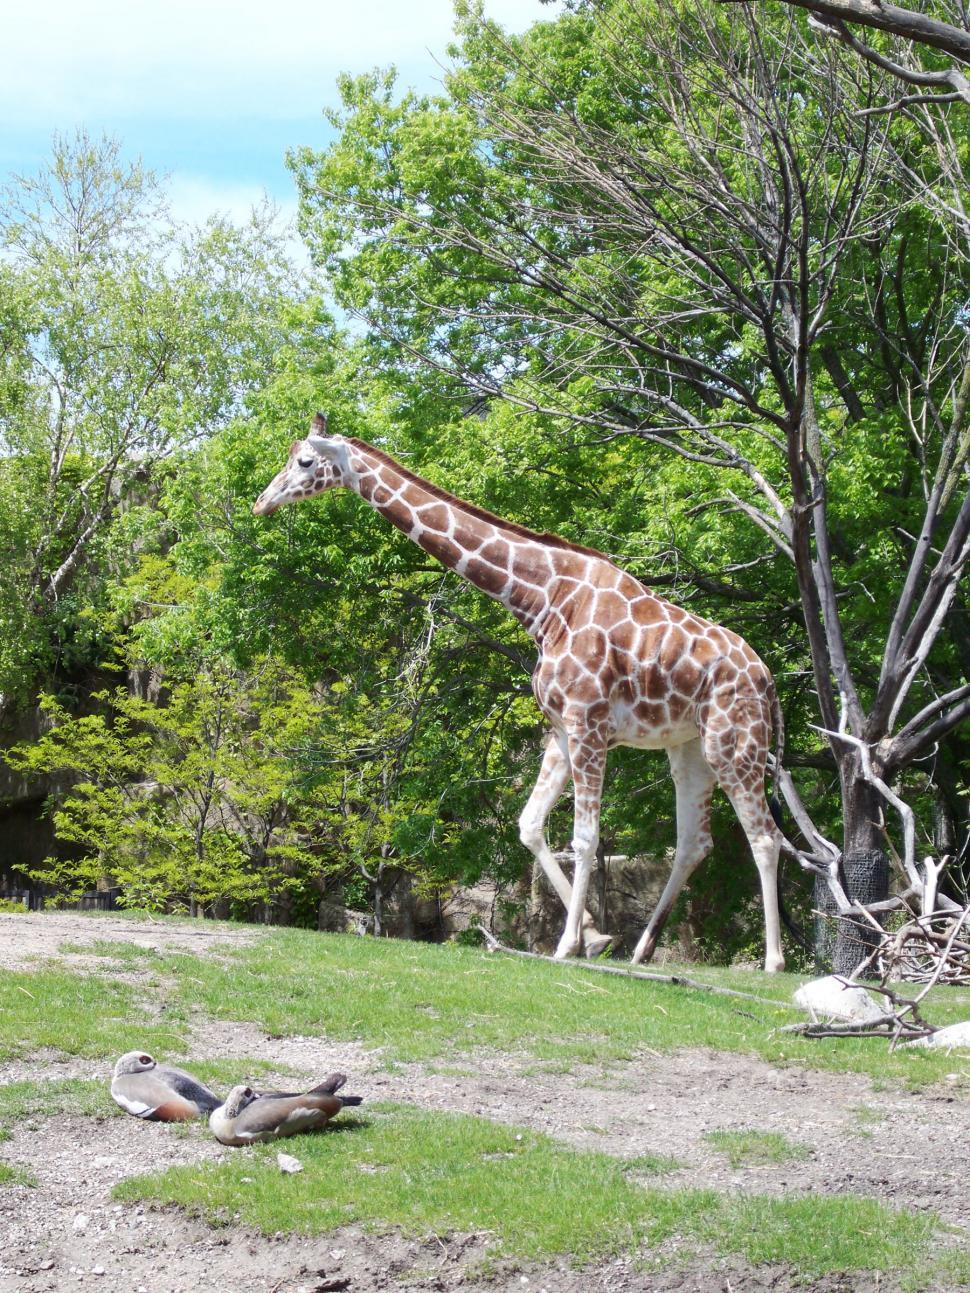 Download Free Stock HD Photo of Giraffe Online